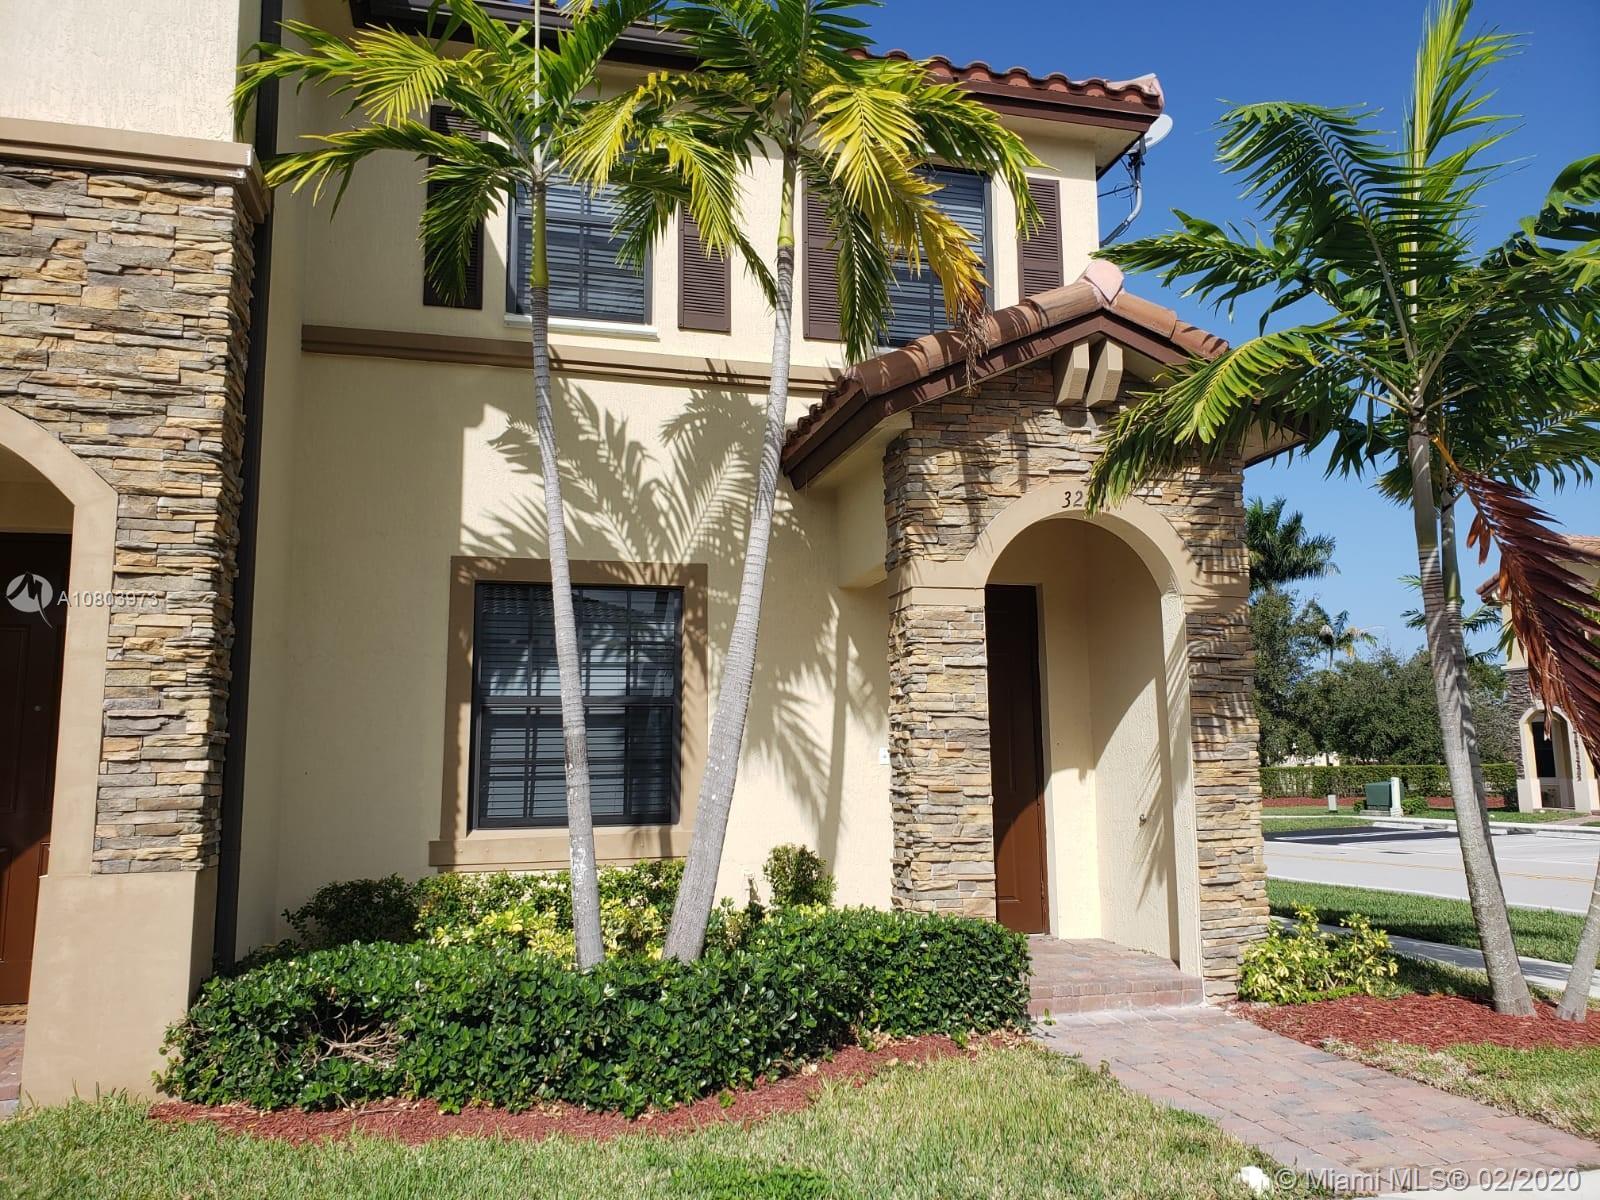 3223 SE 4th Ct, Homestead, FL 33033 - Homestead, FL real estate listing